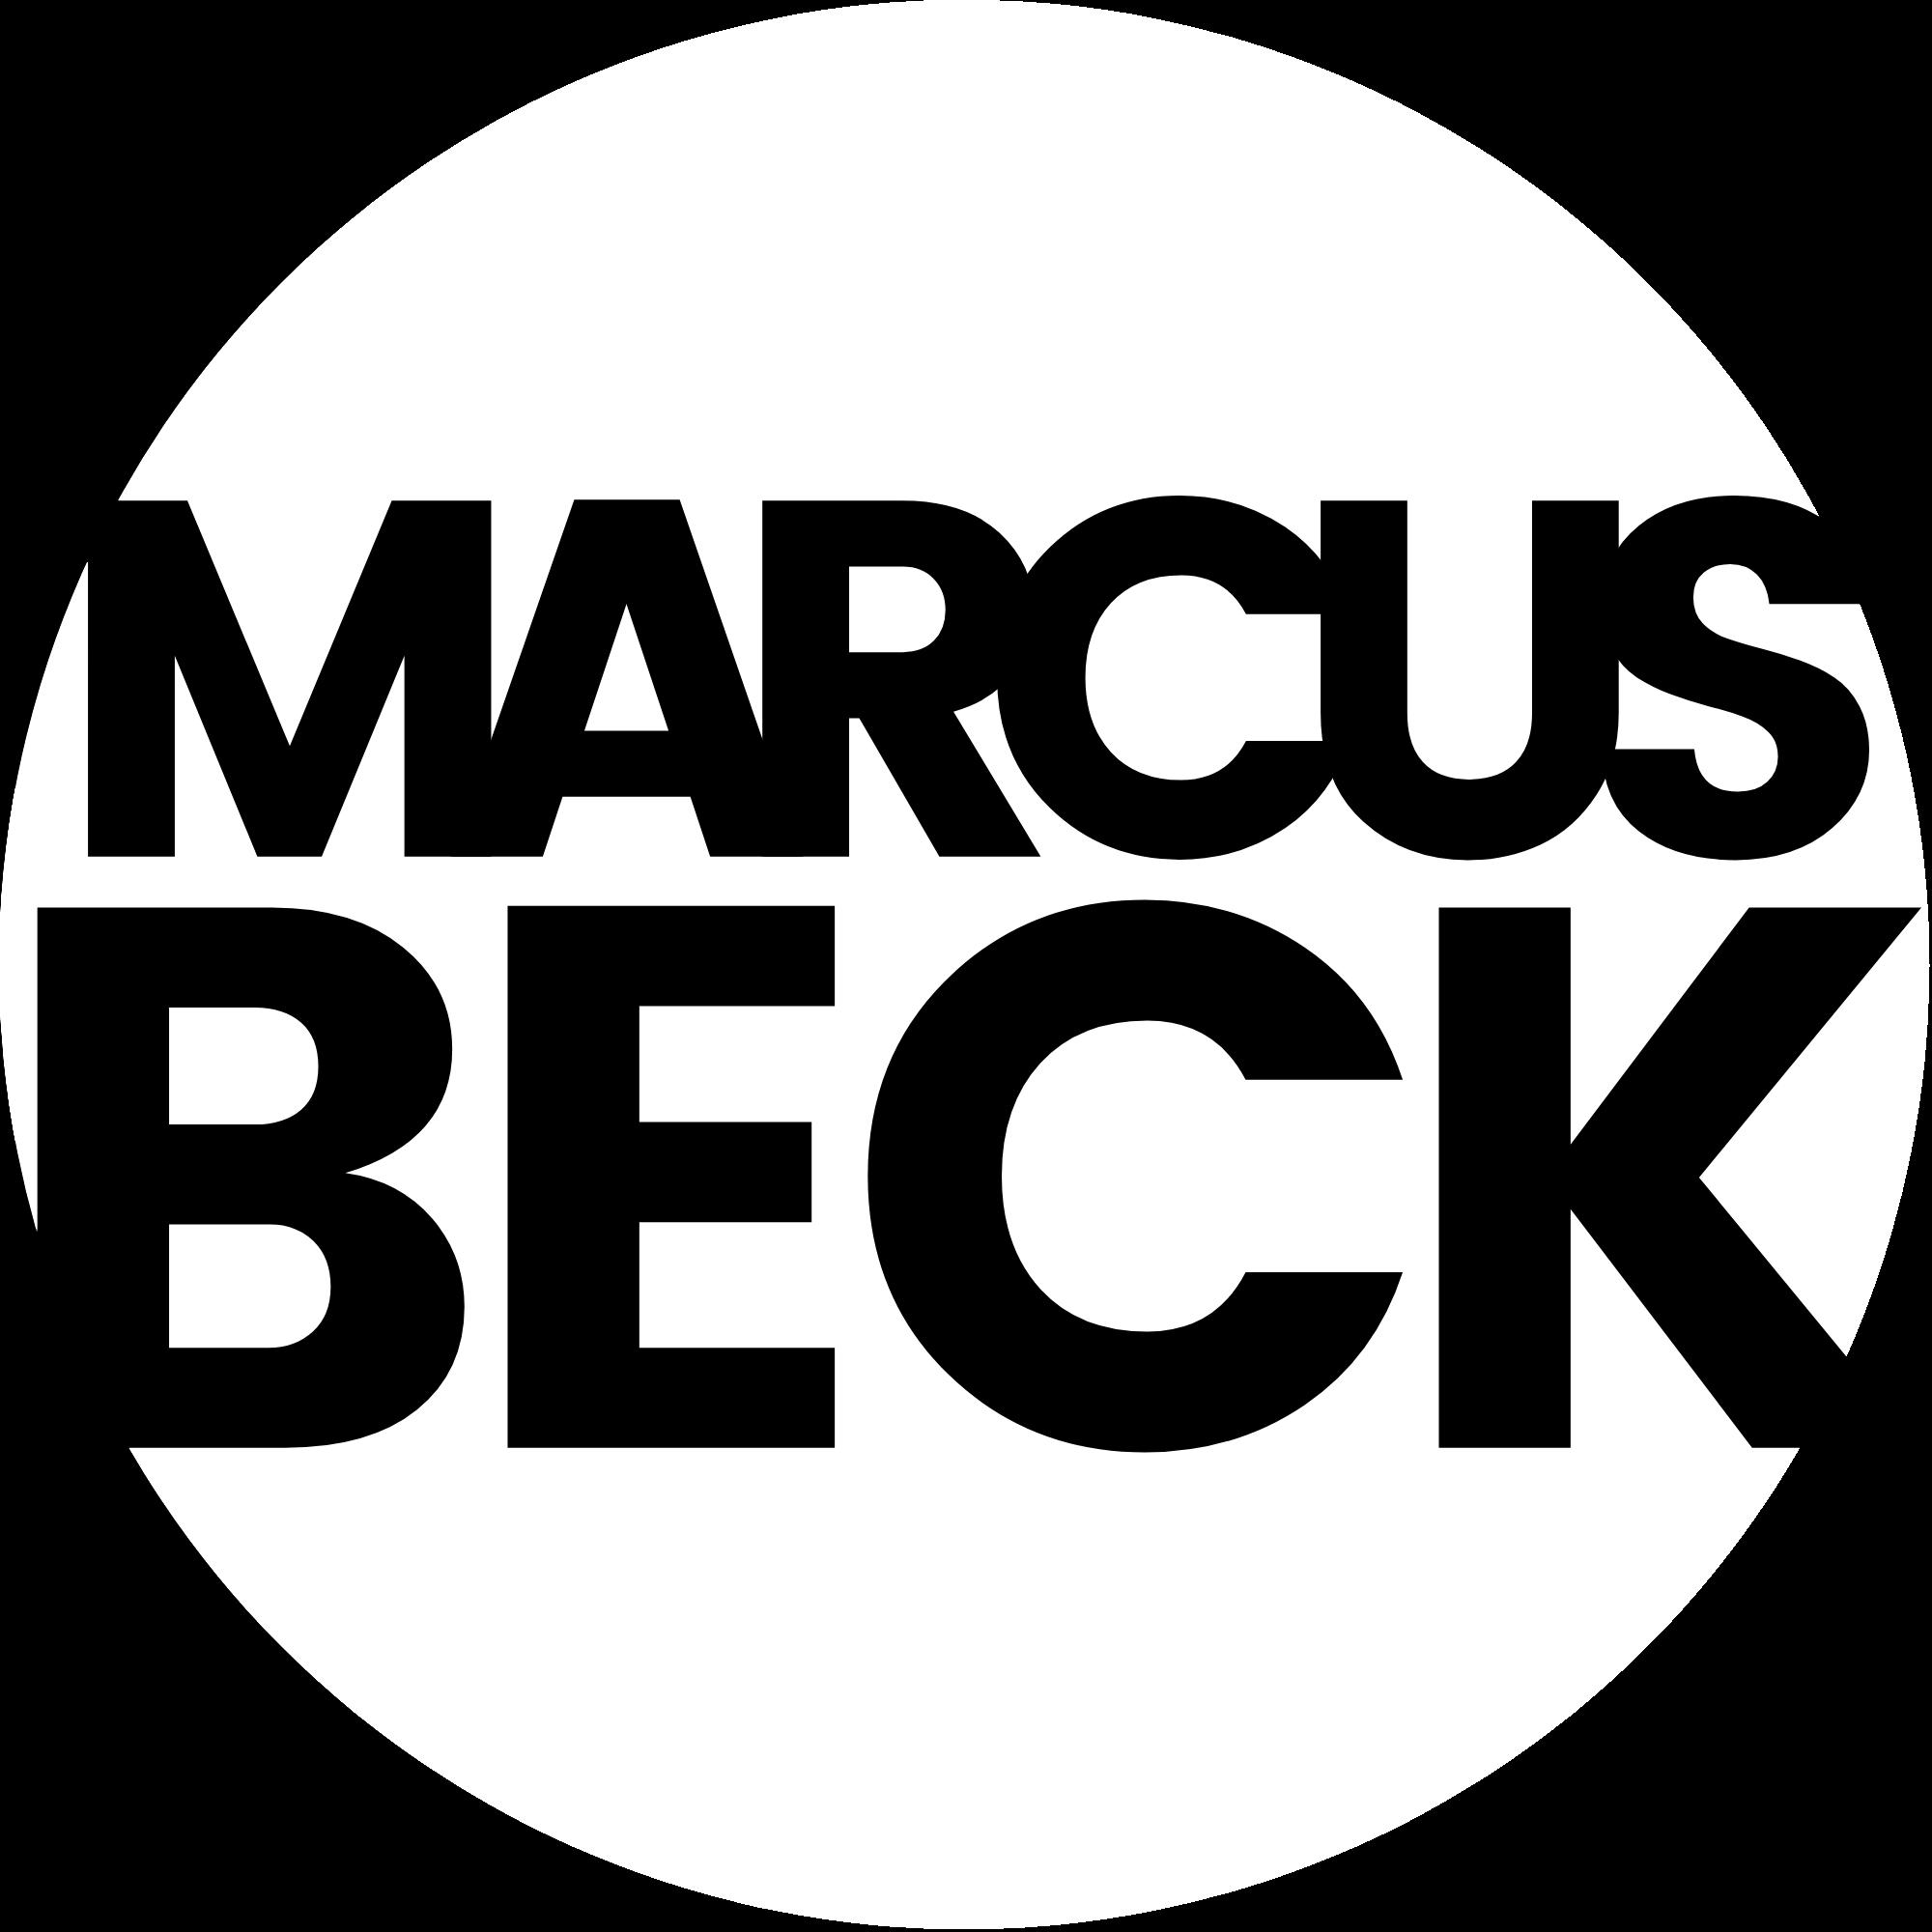 Marcus Beck